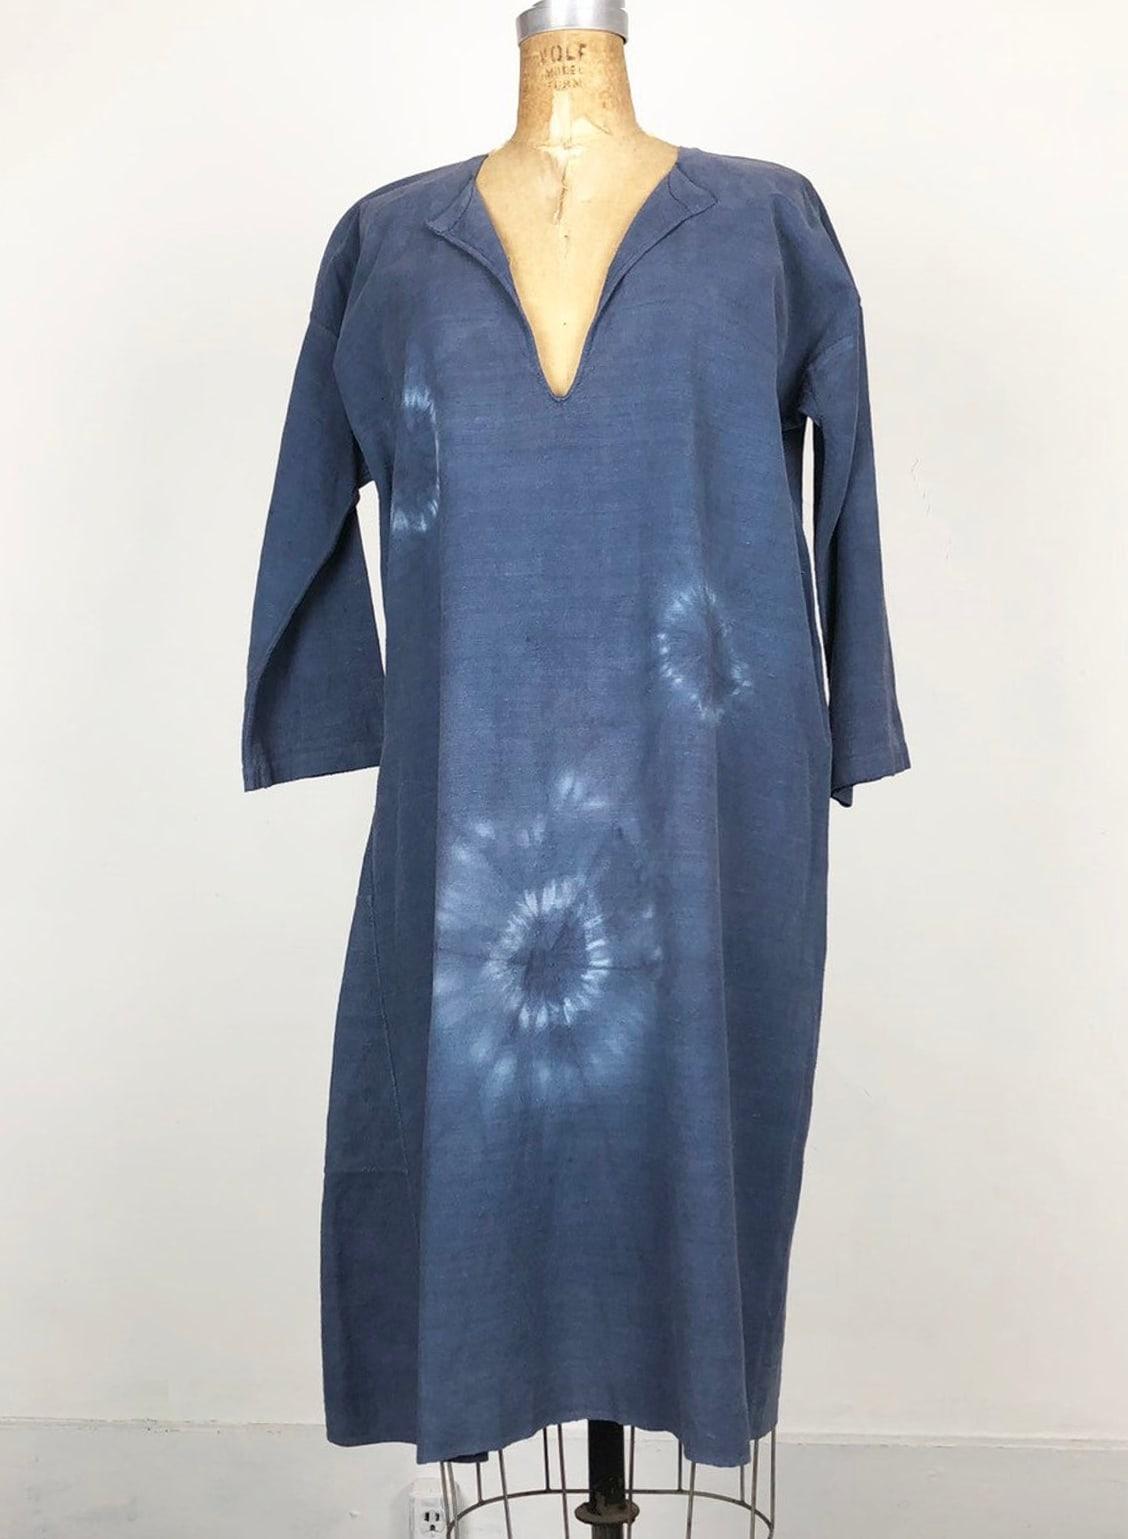 Antique Indigo Dyed French Linen Tunic S